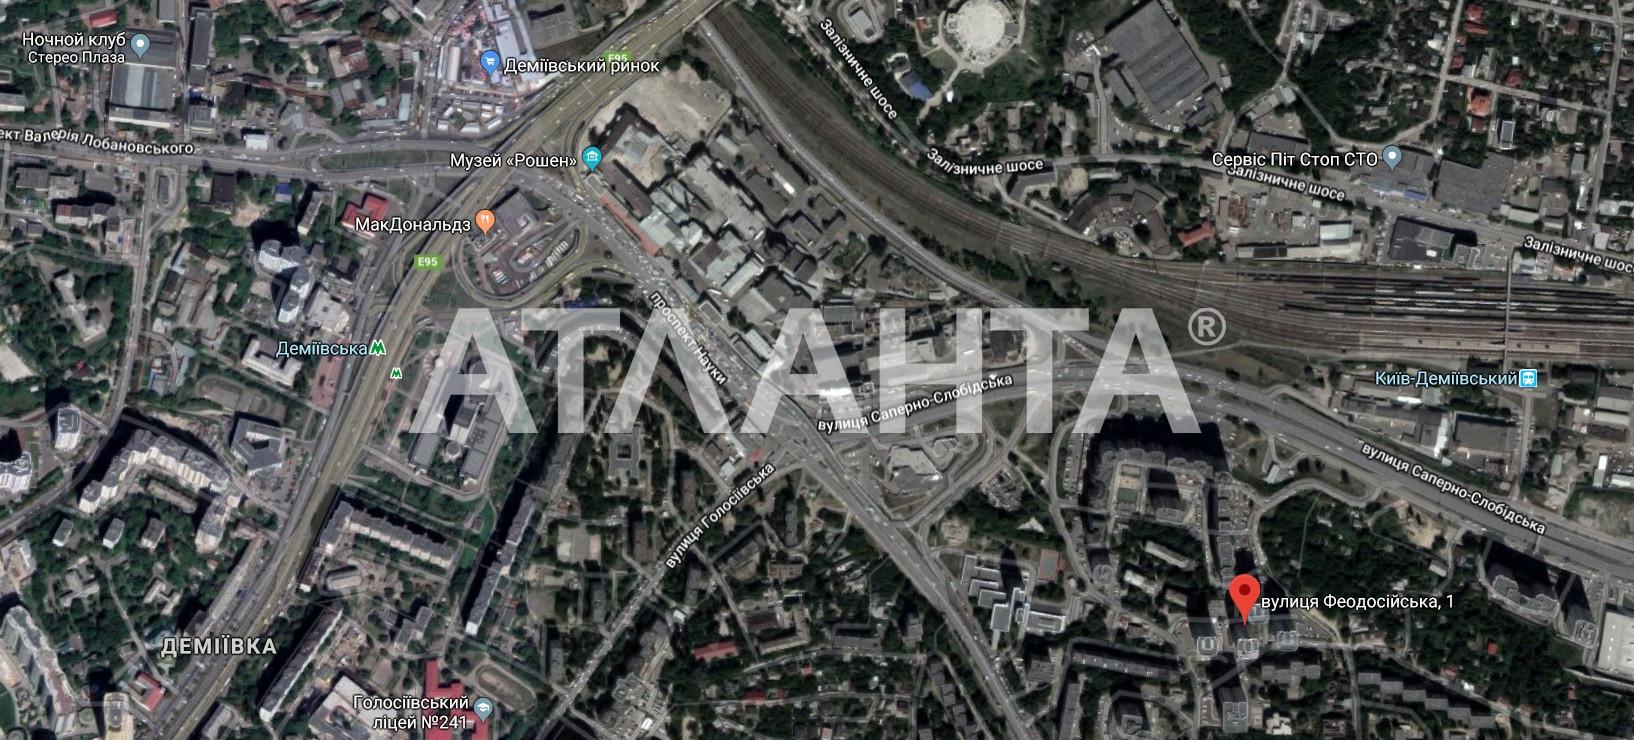 Продается 2-комнатная Квартира на ул. Феодосийская — 78 000 у.е. (фото №11)